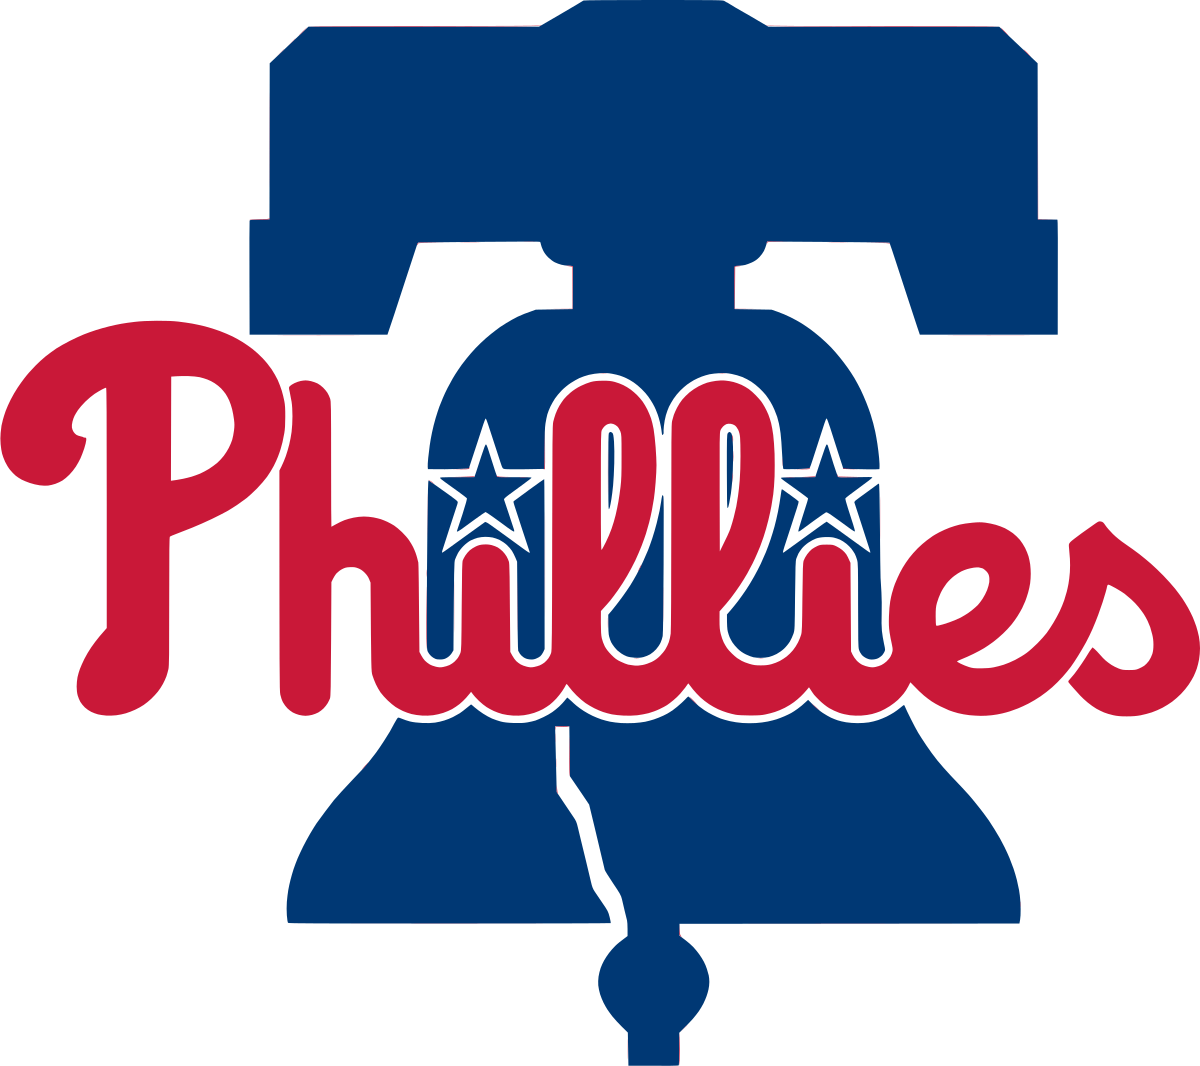 Philadelphia Phillies Logo In 2020 Philadelphia Phillies Logo Phillies Philadelphia Phillies